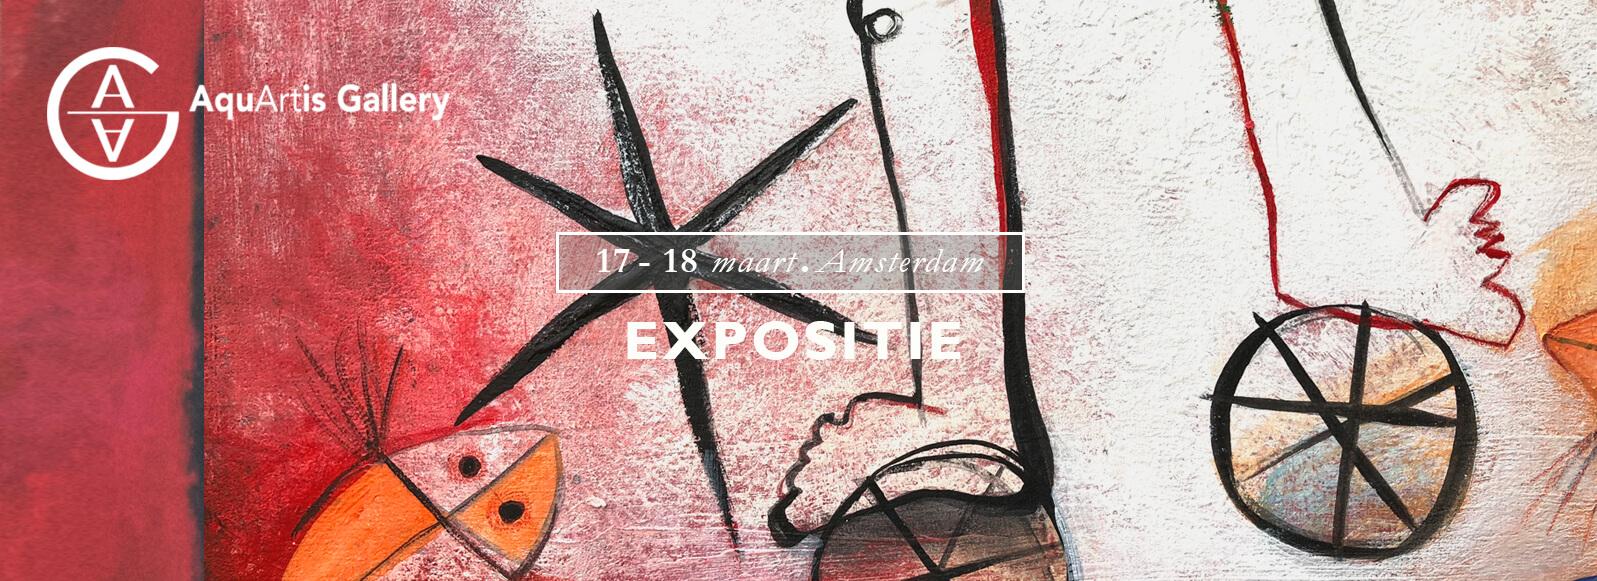 Exposition Ángeles Nieto Amsterdam March 2018